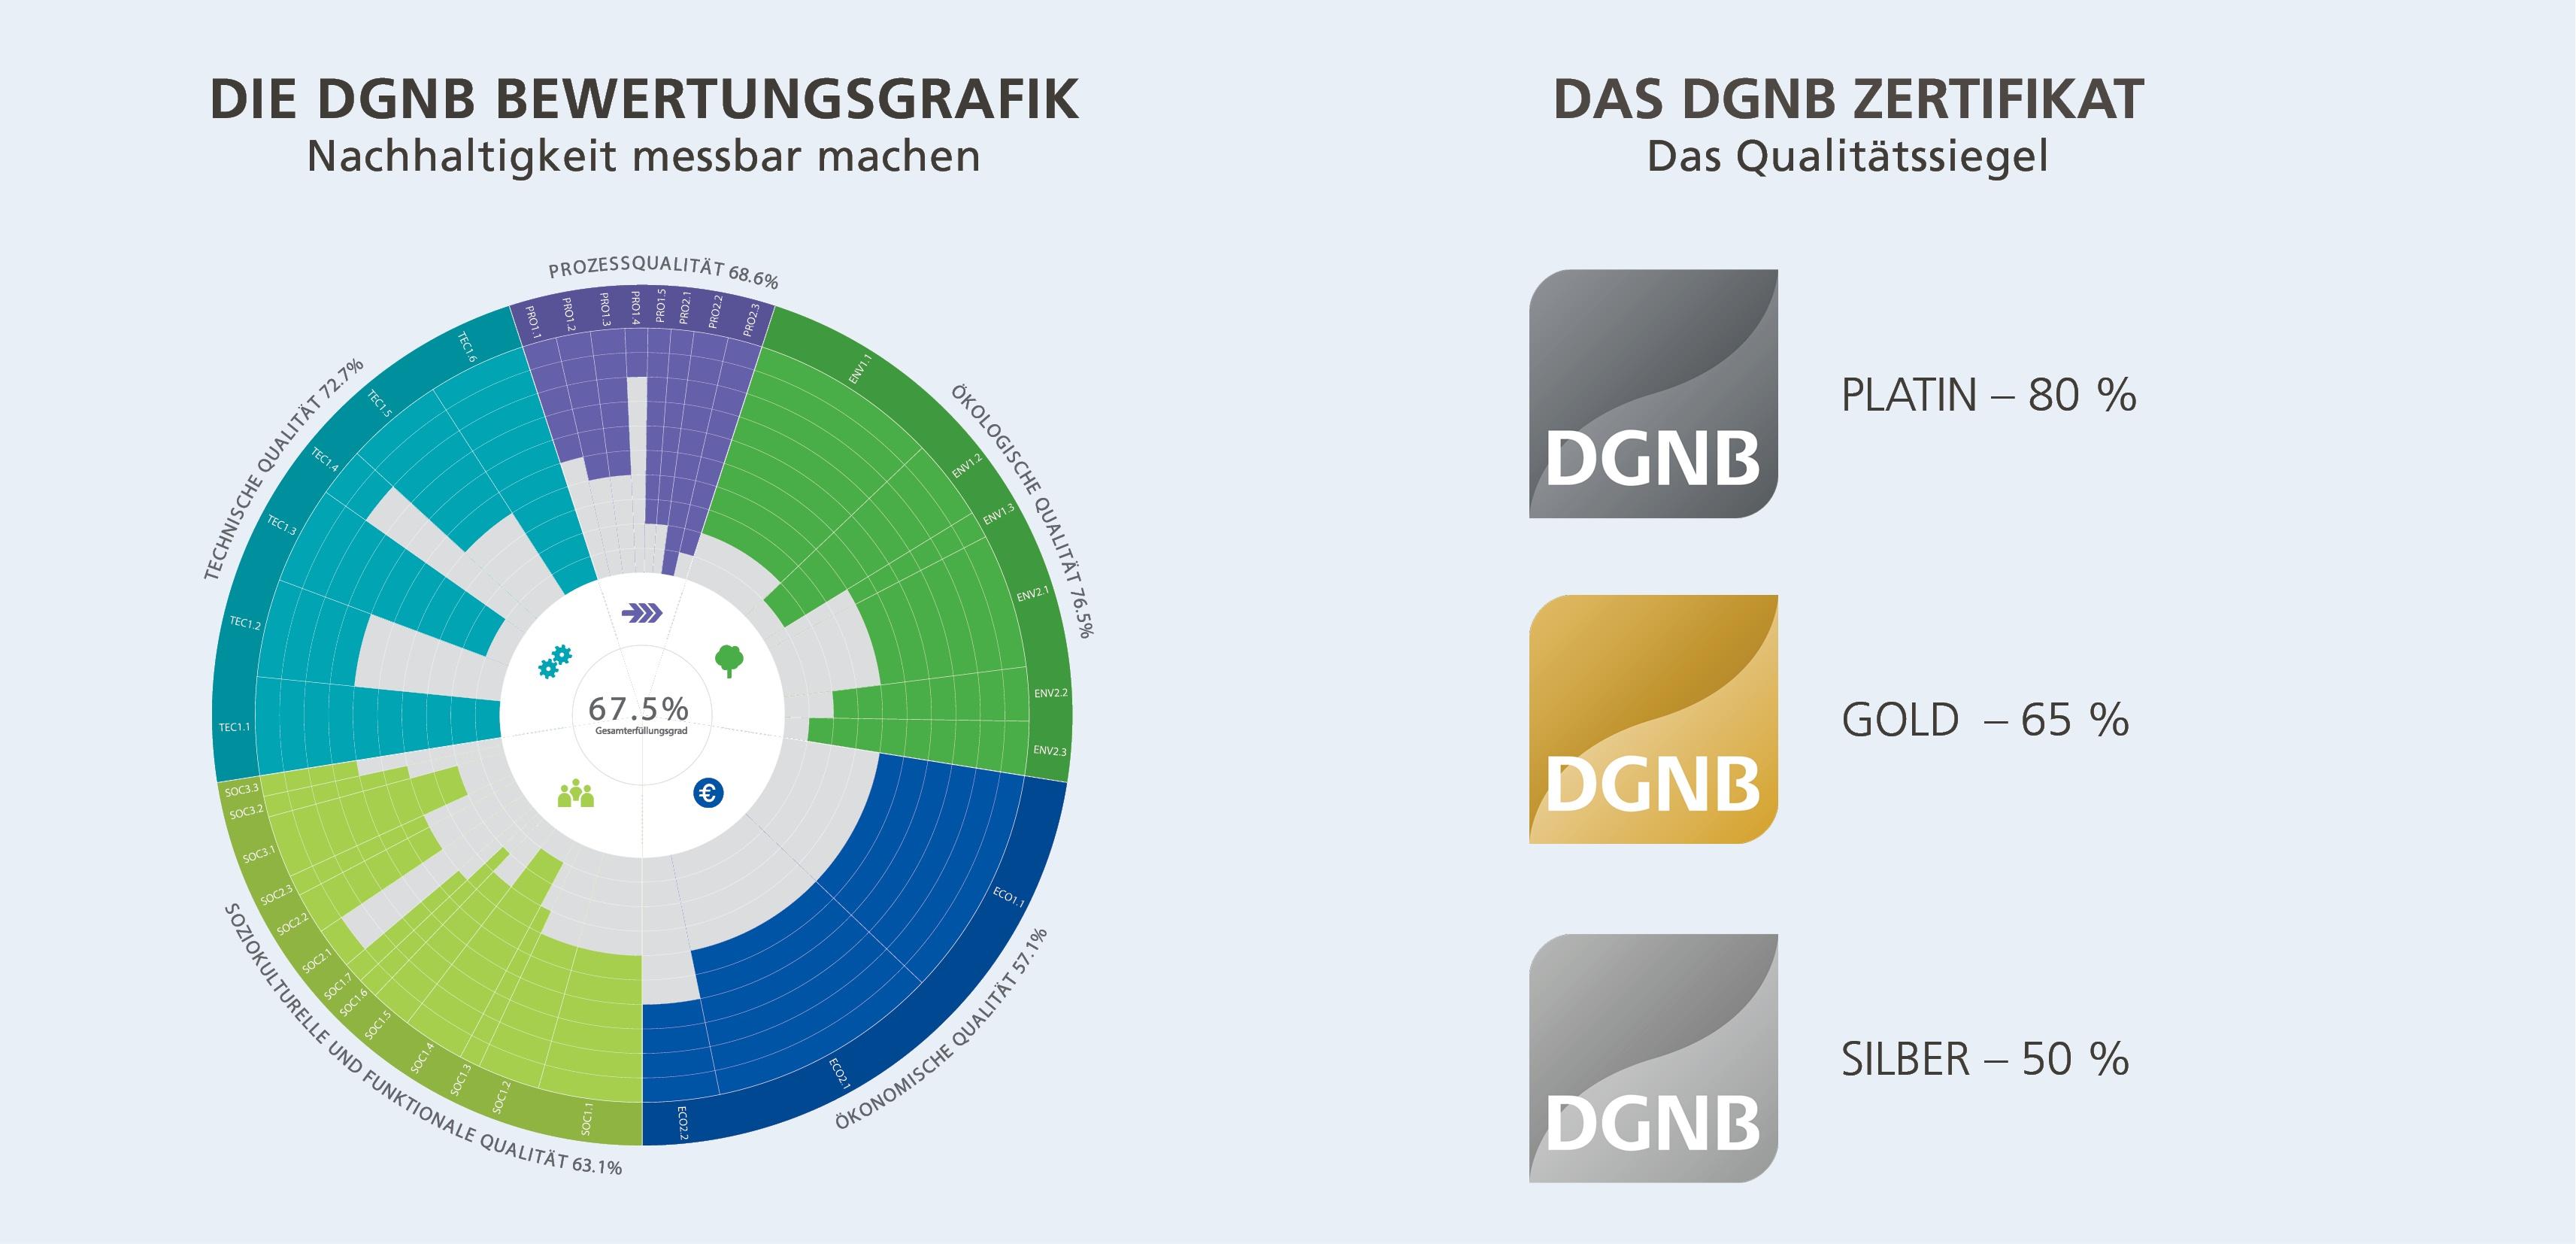 Bewertungssystem DGNB